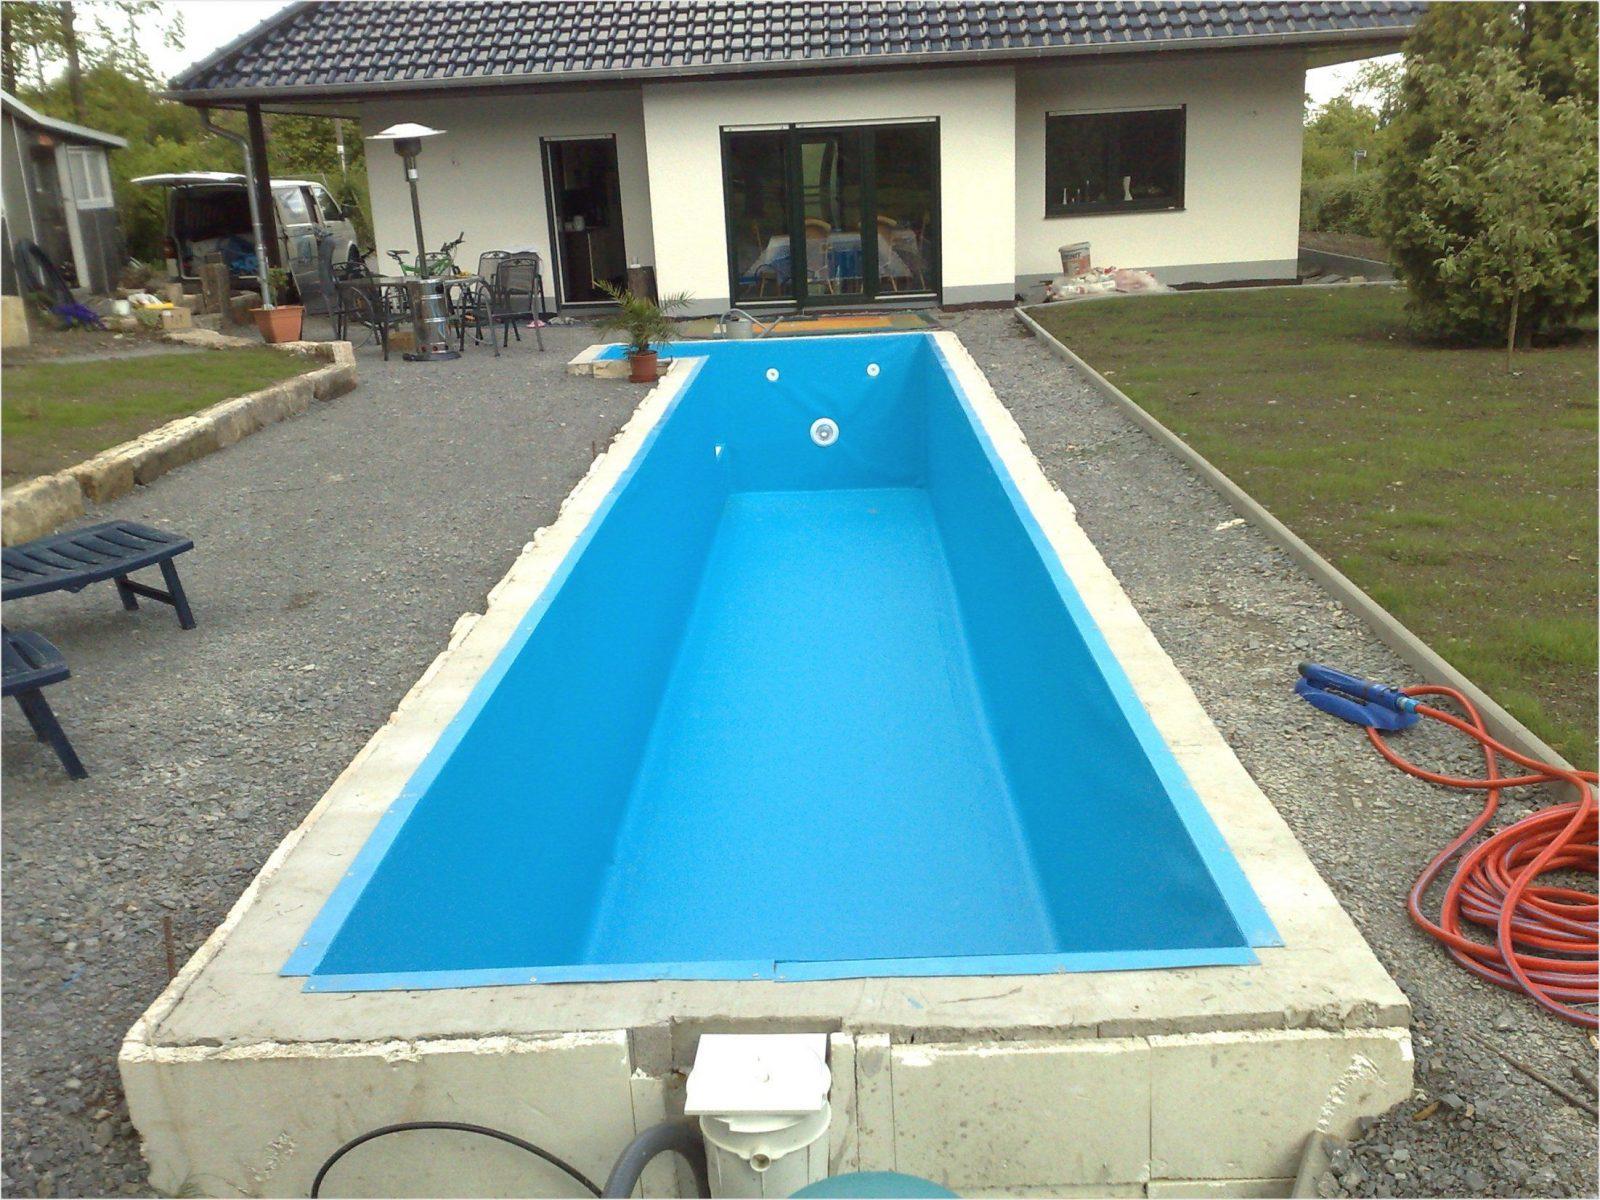 Luxus Schwimmbad Kaufen Preise Zz05 Hitoiro Pool Selber Bauen Billig von Pool Selber Bauen Billig Bild